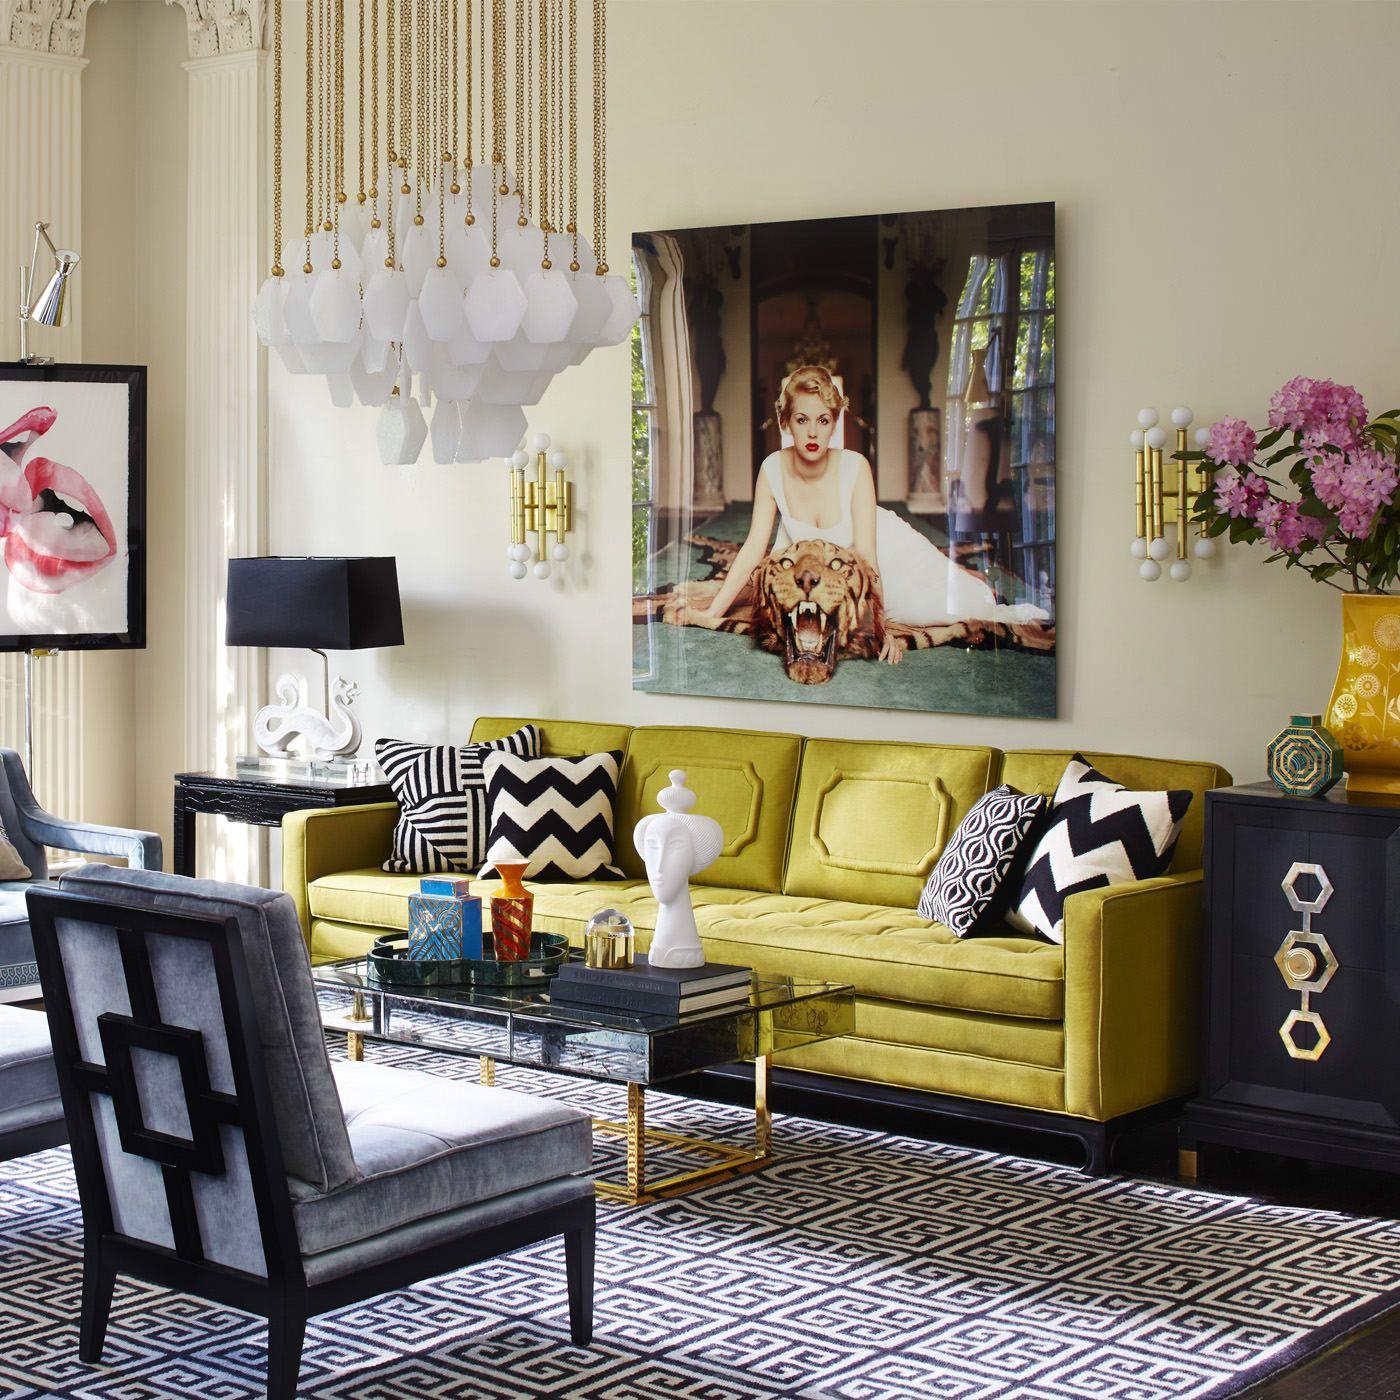 Sofa Sale PEKING SOFA BY JONATHAN ADLER Chinoiserie detail ua Ming inspired black base and